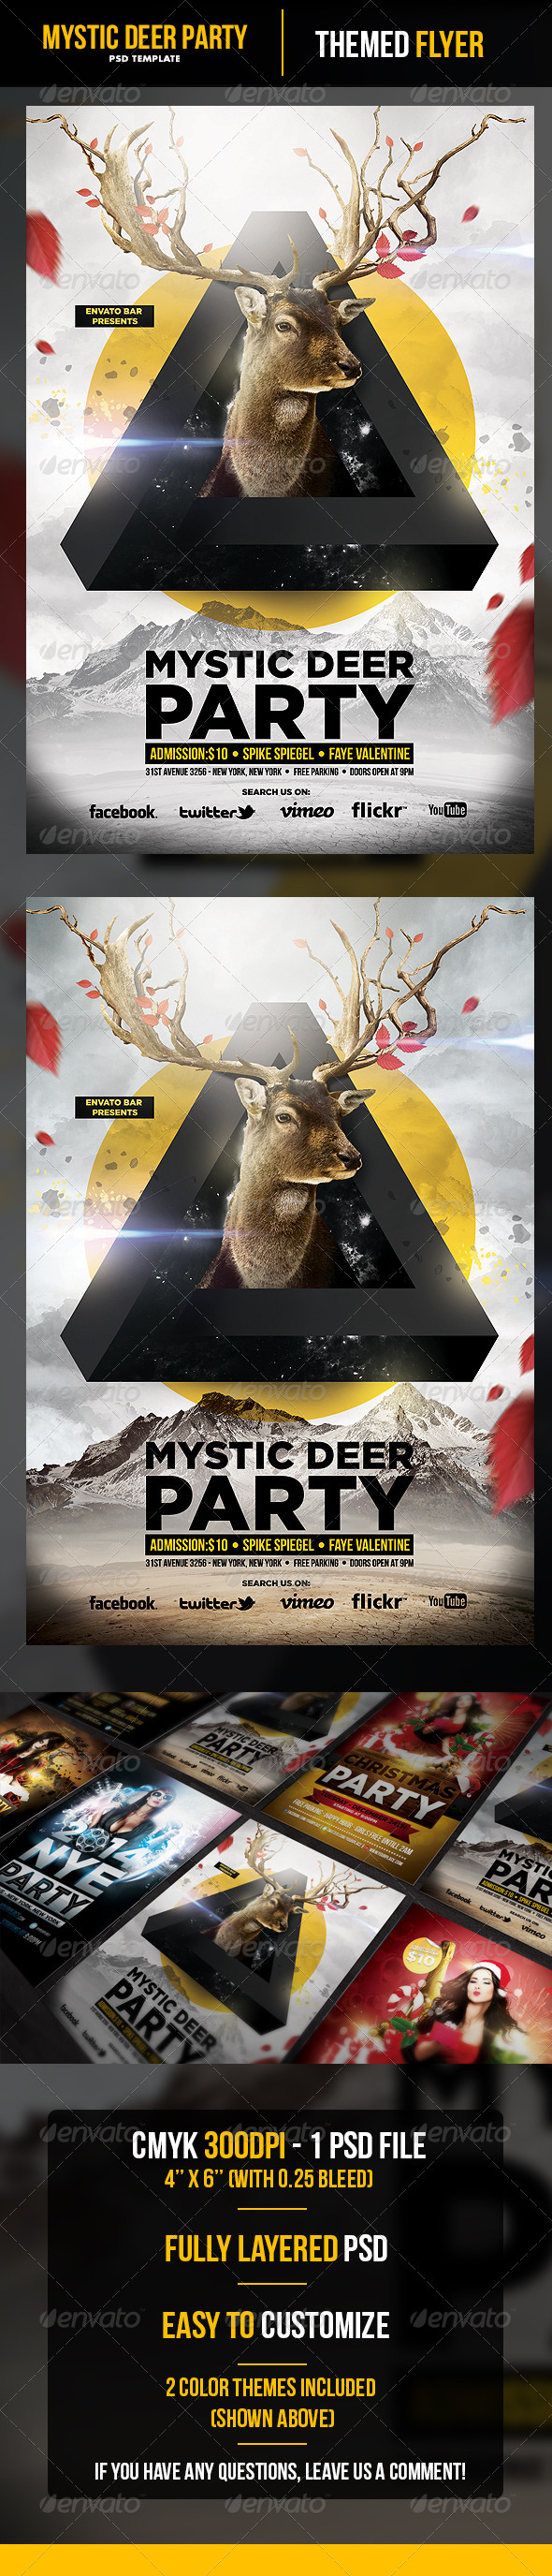 Mystic Deer Flyer Template - Flyers Print Templates